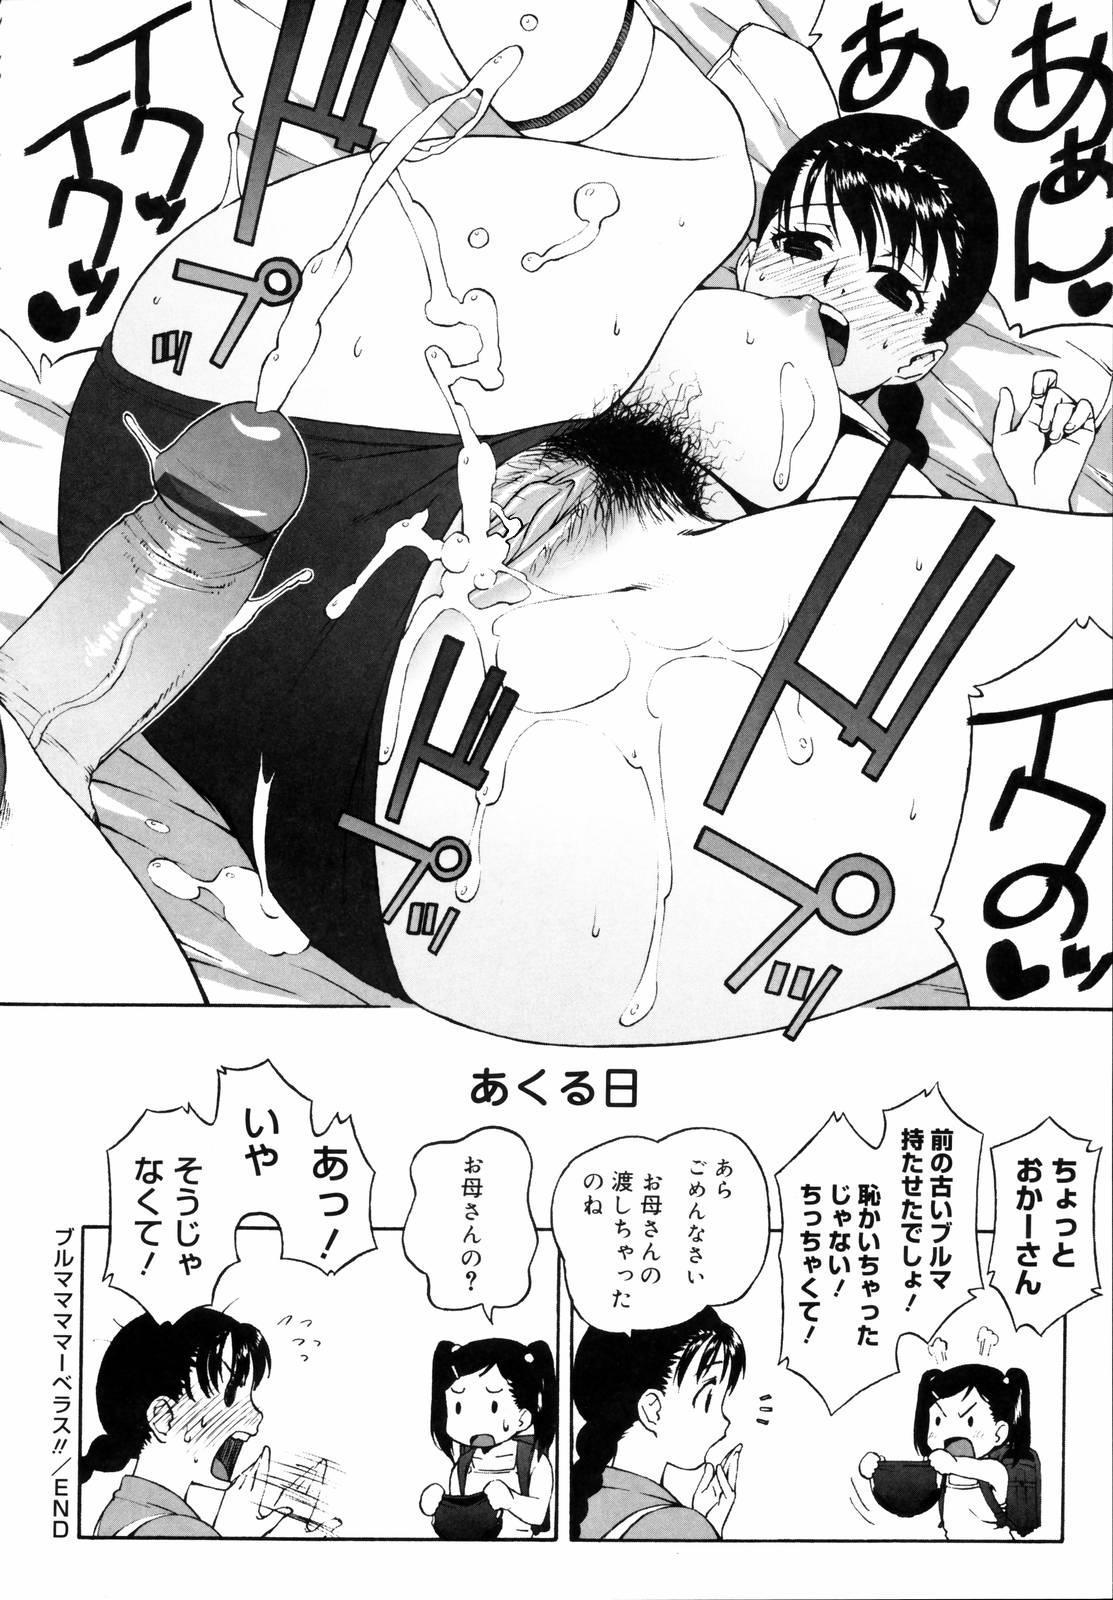 Shishunki wa Hatsujouki - Adolescence is a sexual excitement period. 169